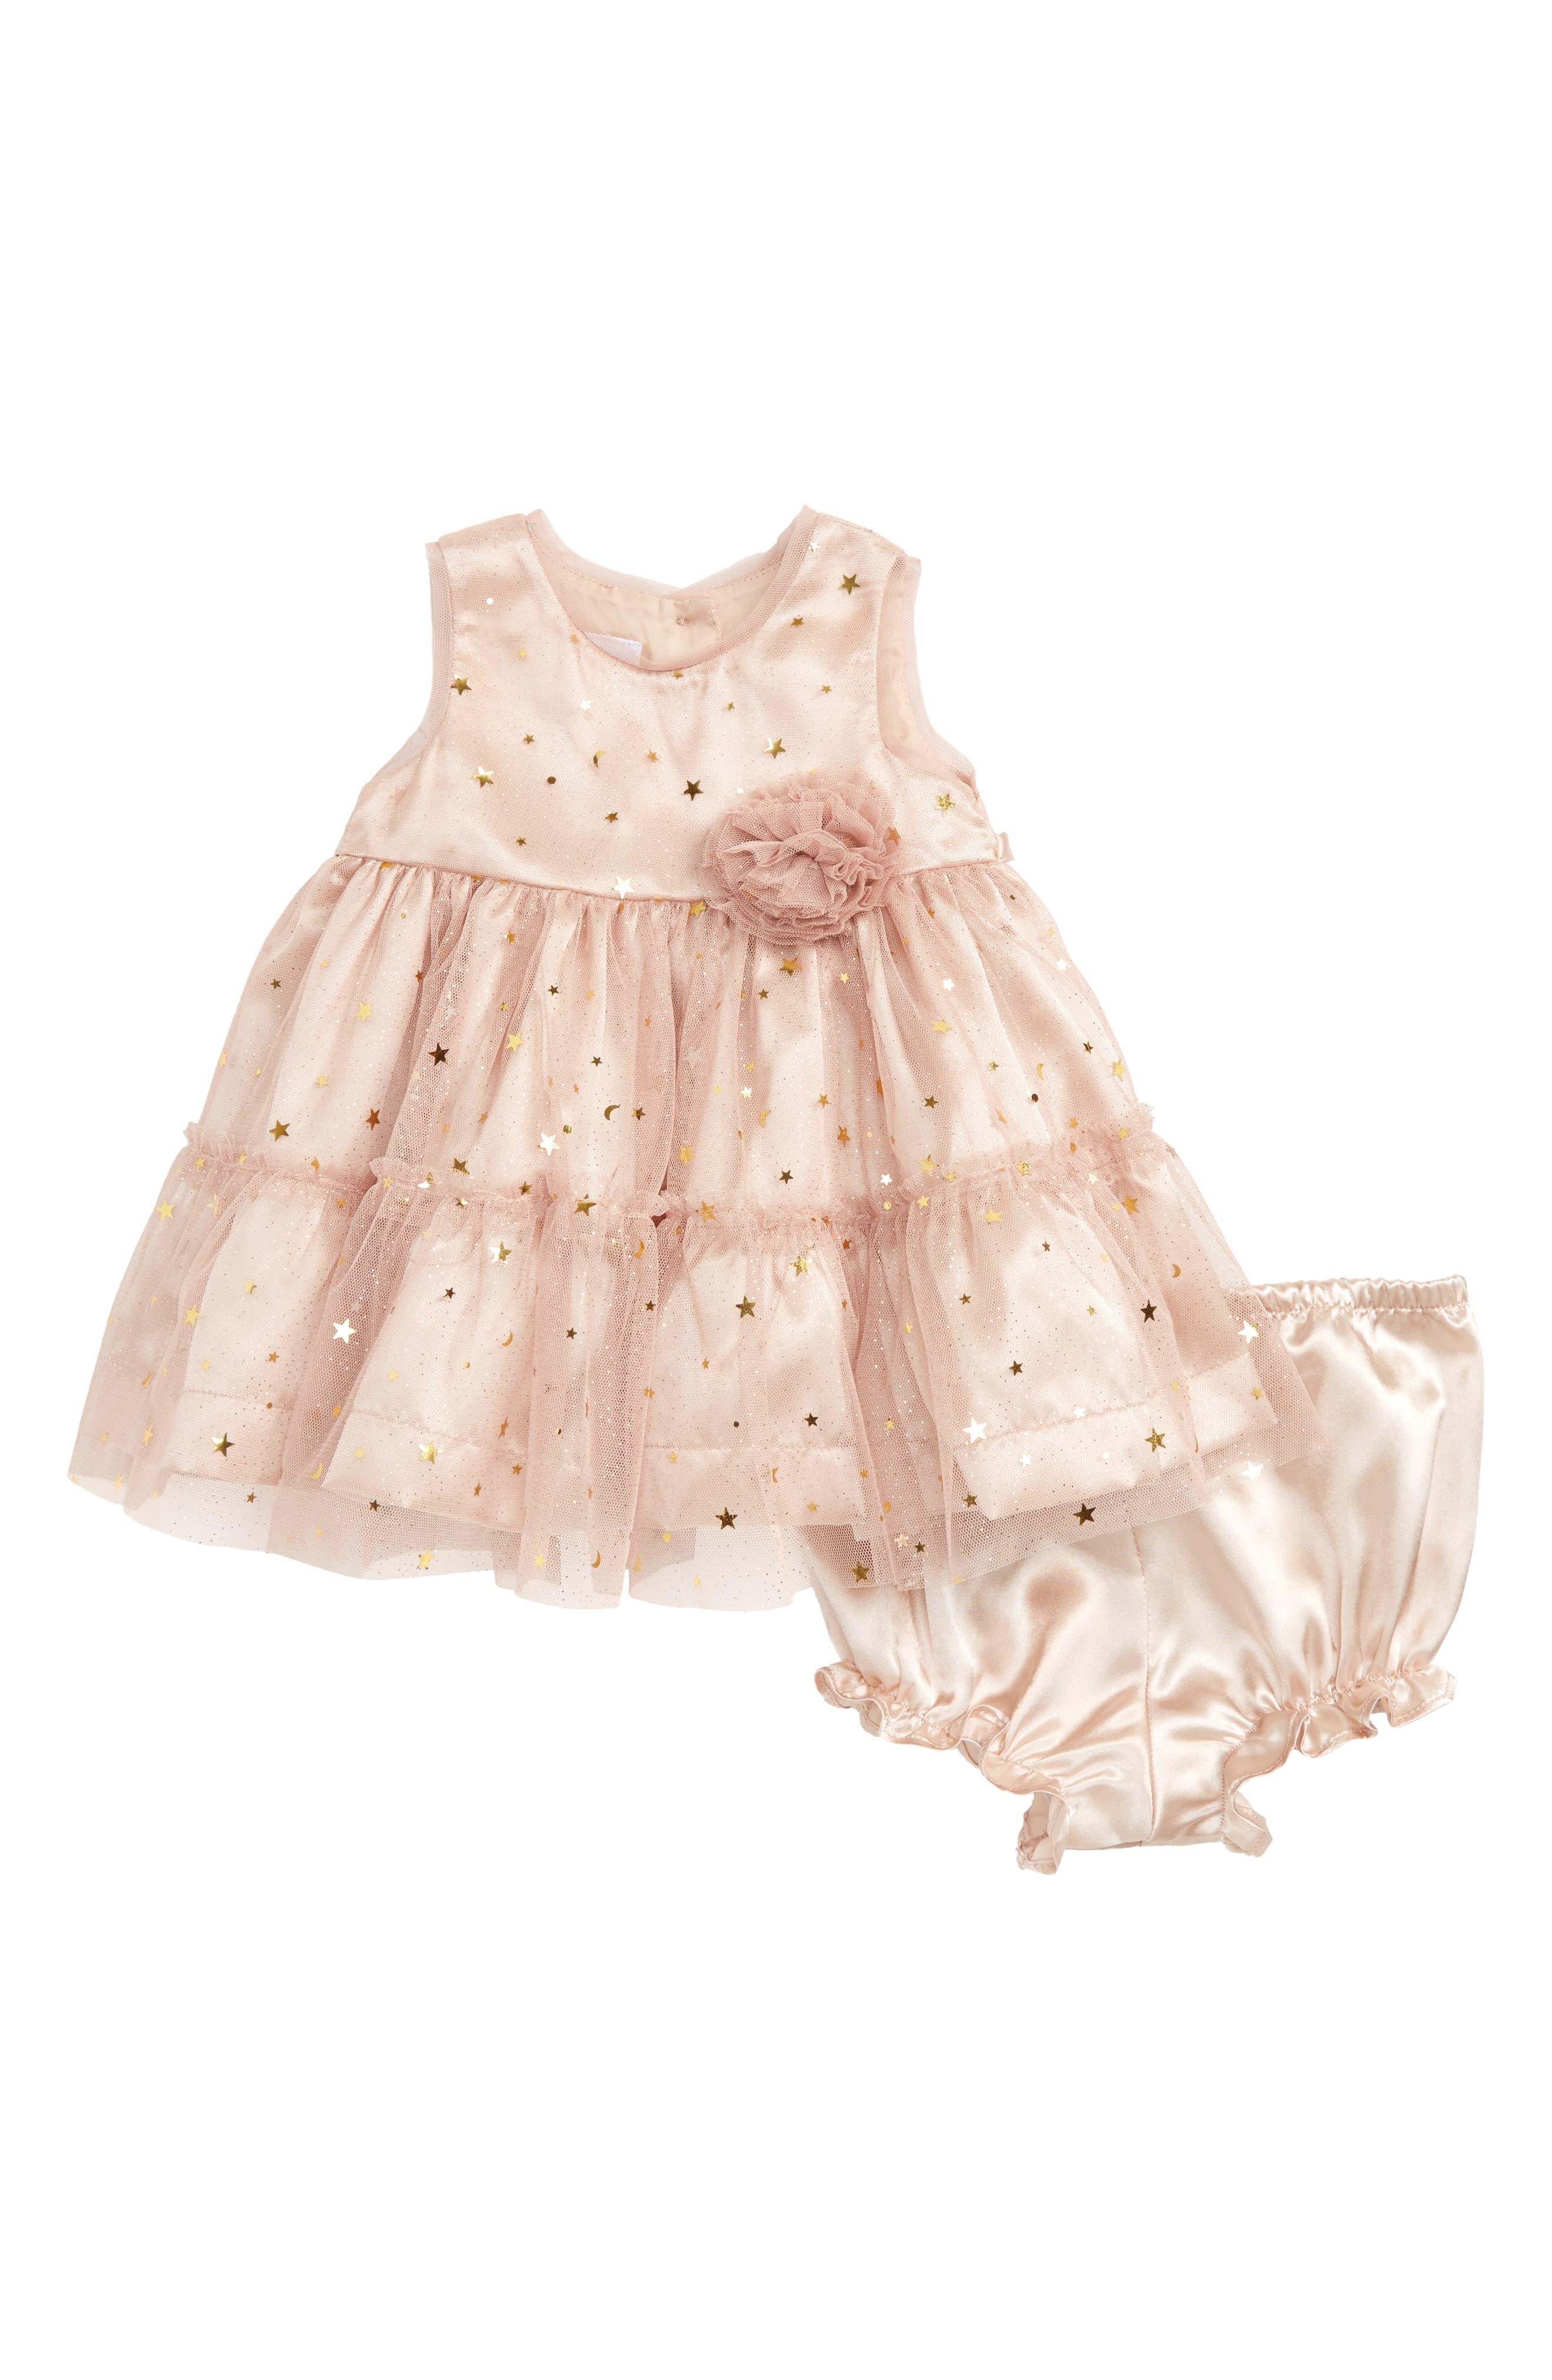 Main Image - Frais Gold Star Dress (Baby Girls)